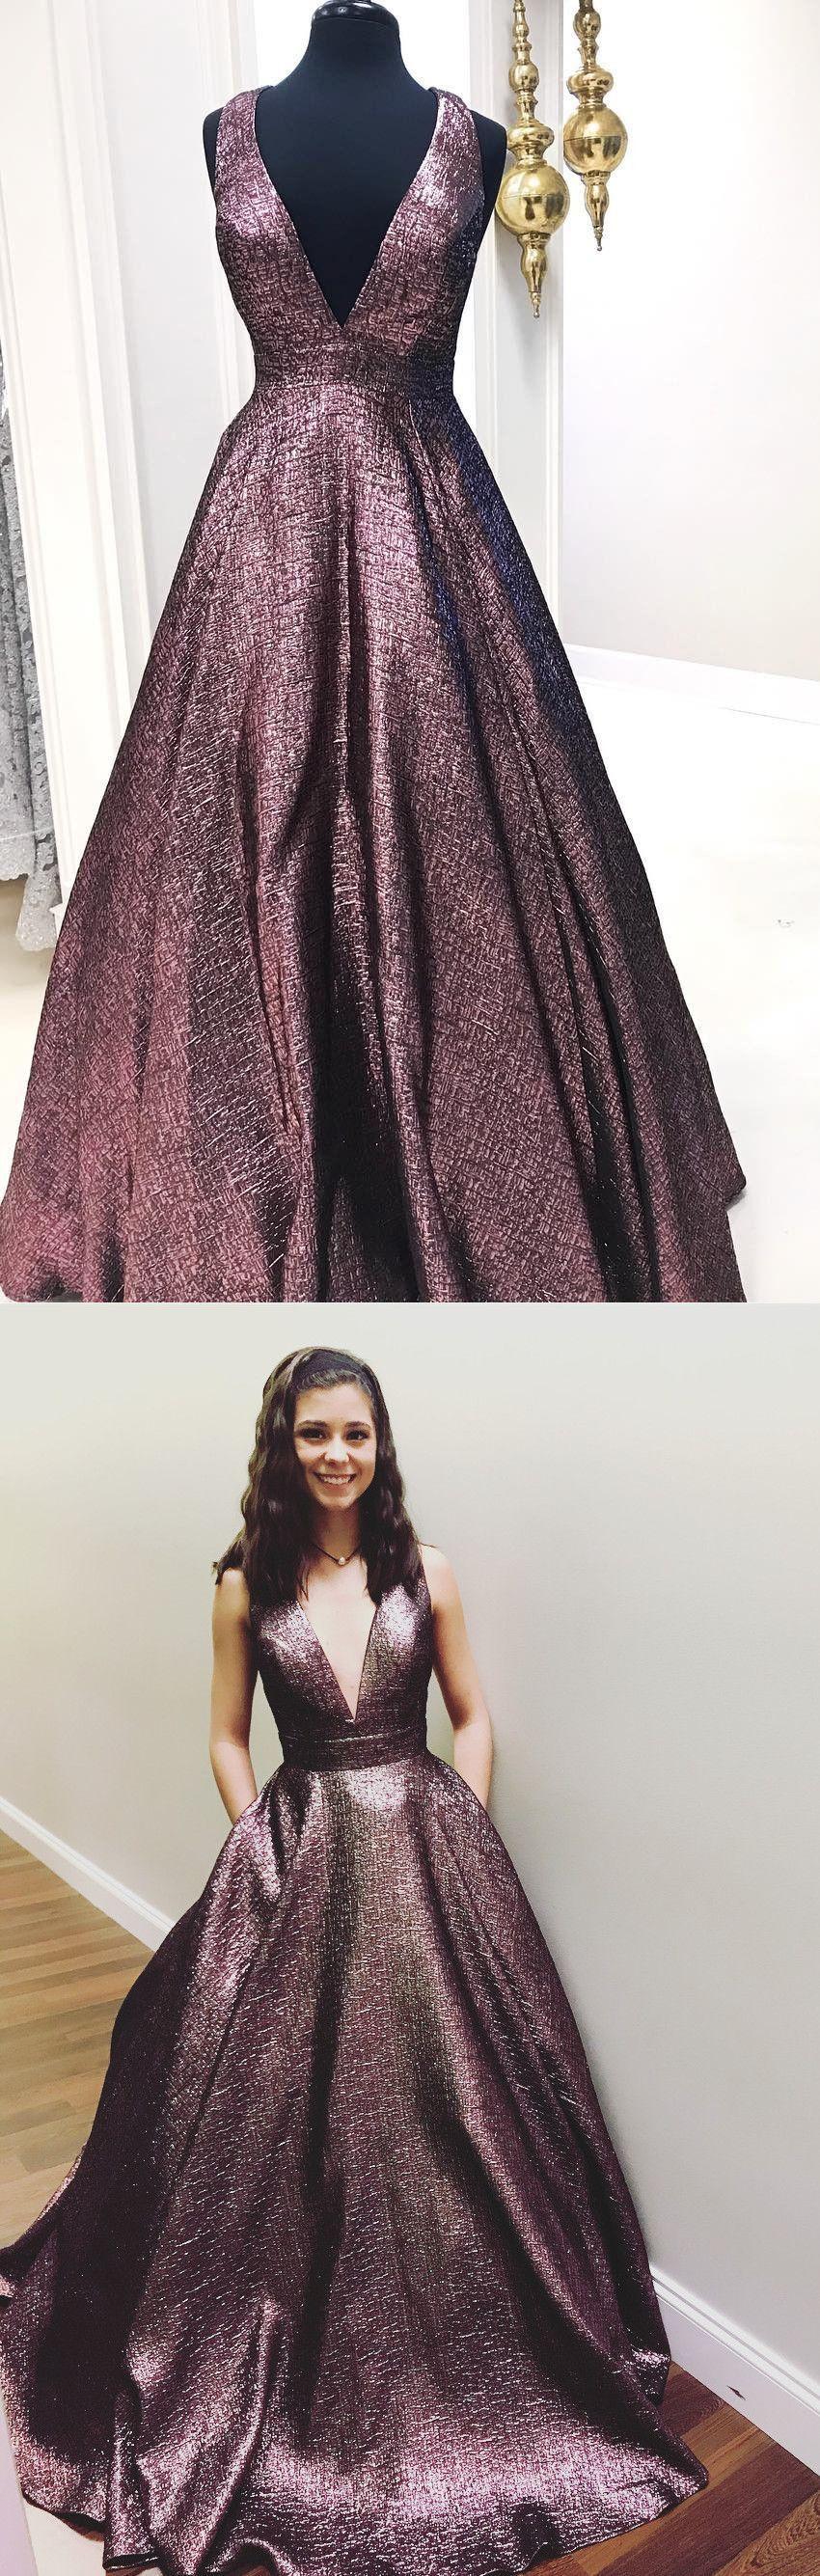 Elegant v neck chocolate long prom dress ball gown